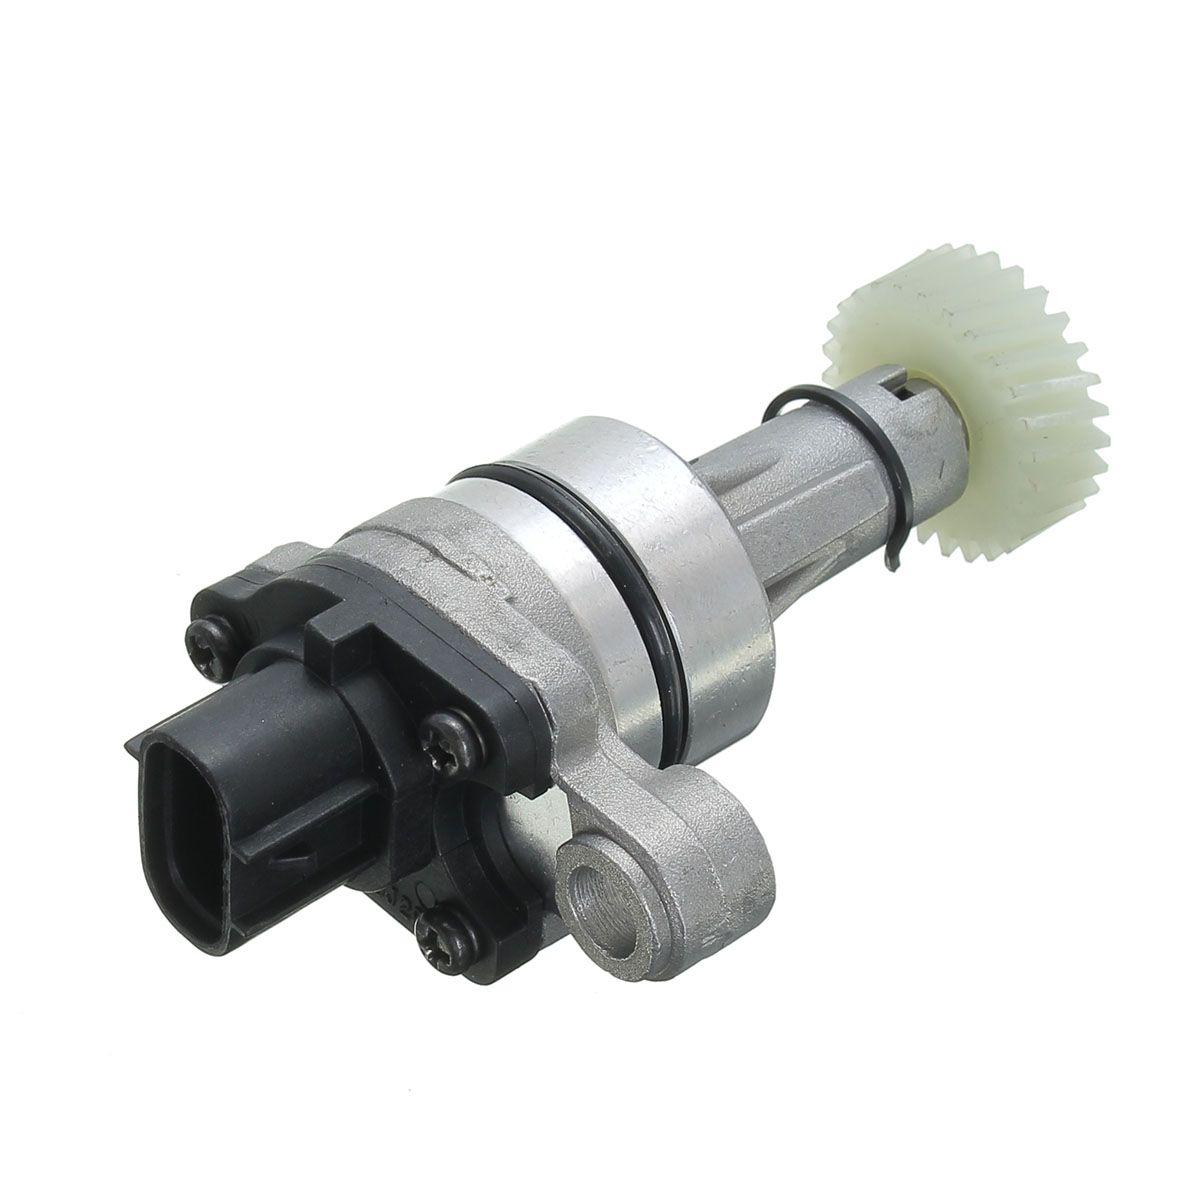 Car Speed Sensor With Gear For Toyota /Lexus /Geo /Chevrolet /Pontiac 83181-12020